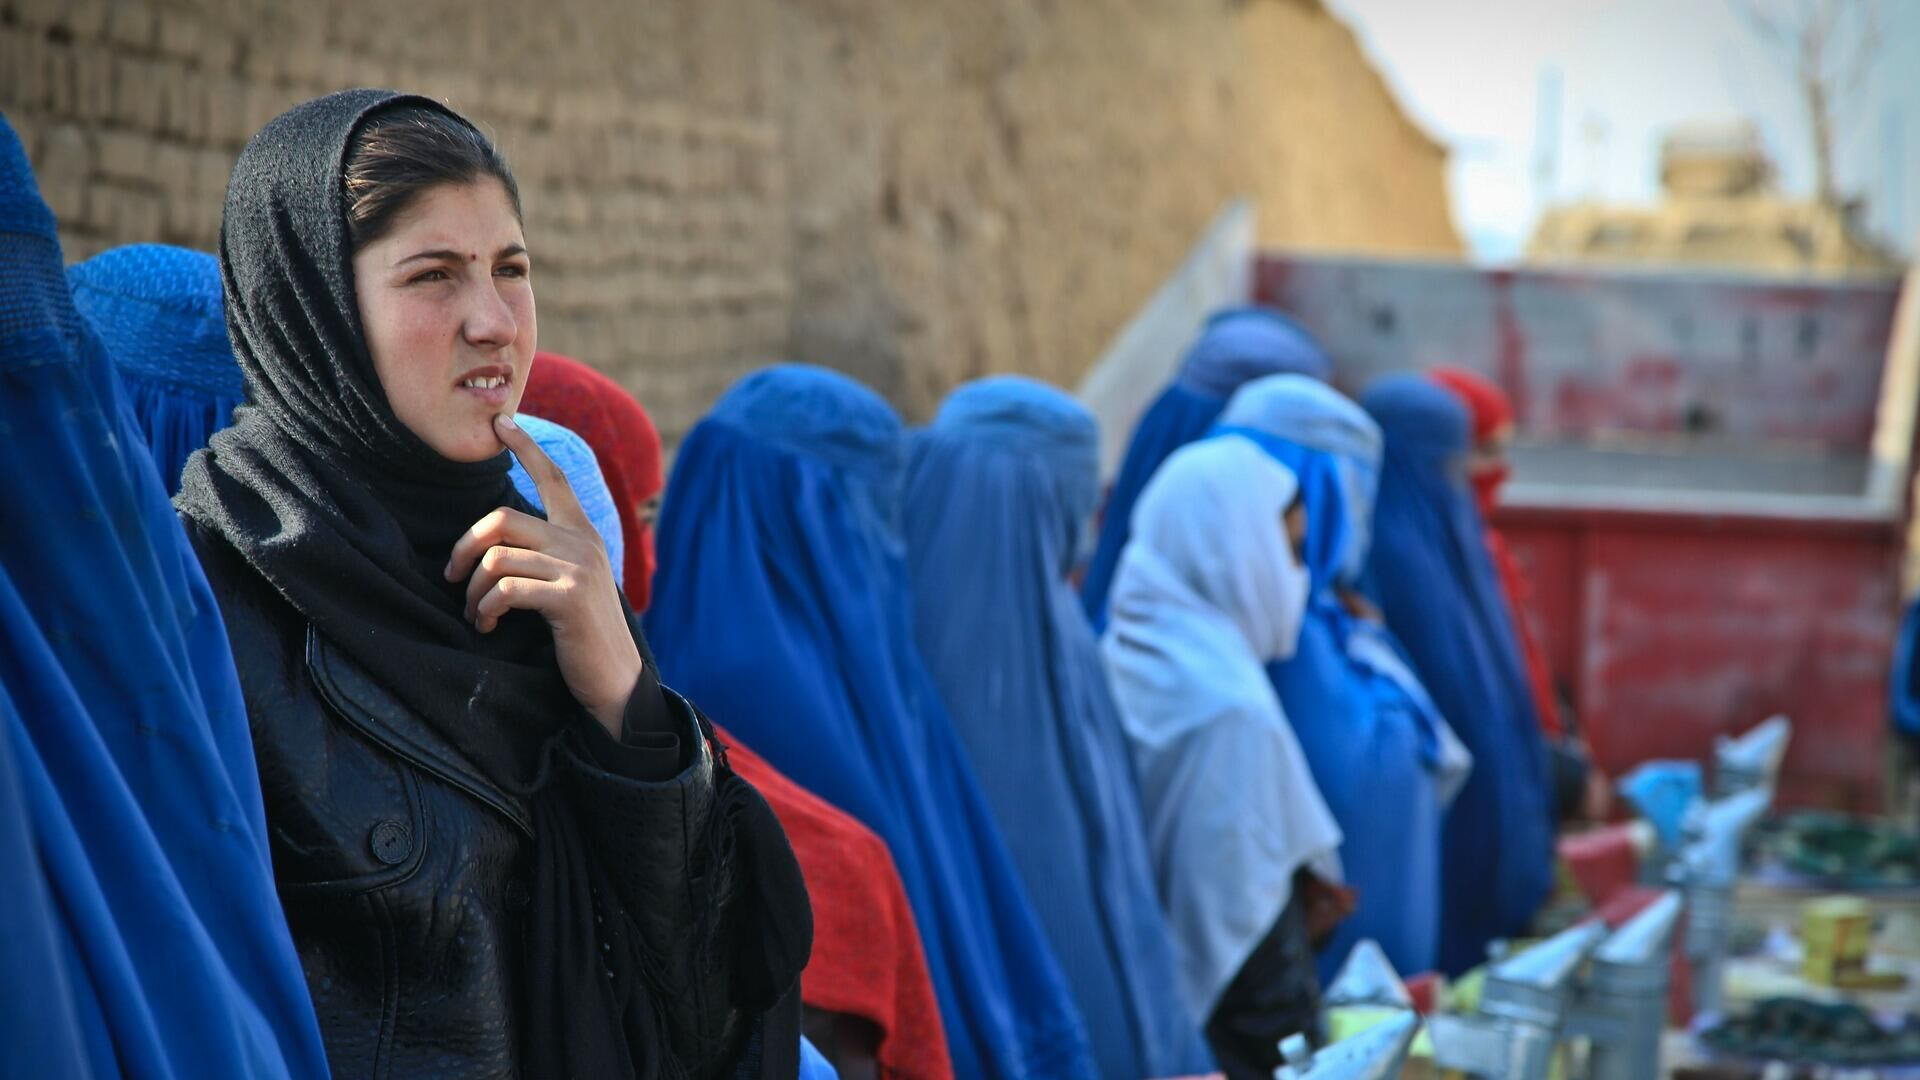 Donne afgane in burqa - Sputnik Italia, 1920, 21.08.2021